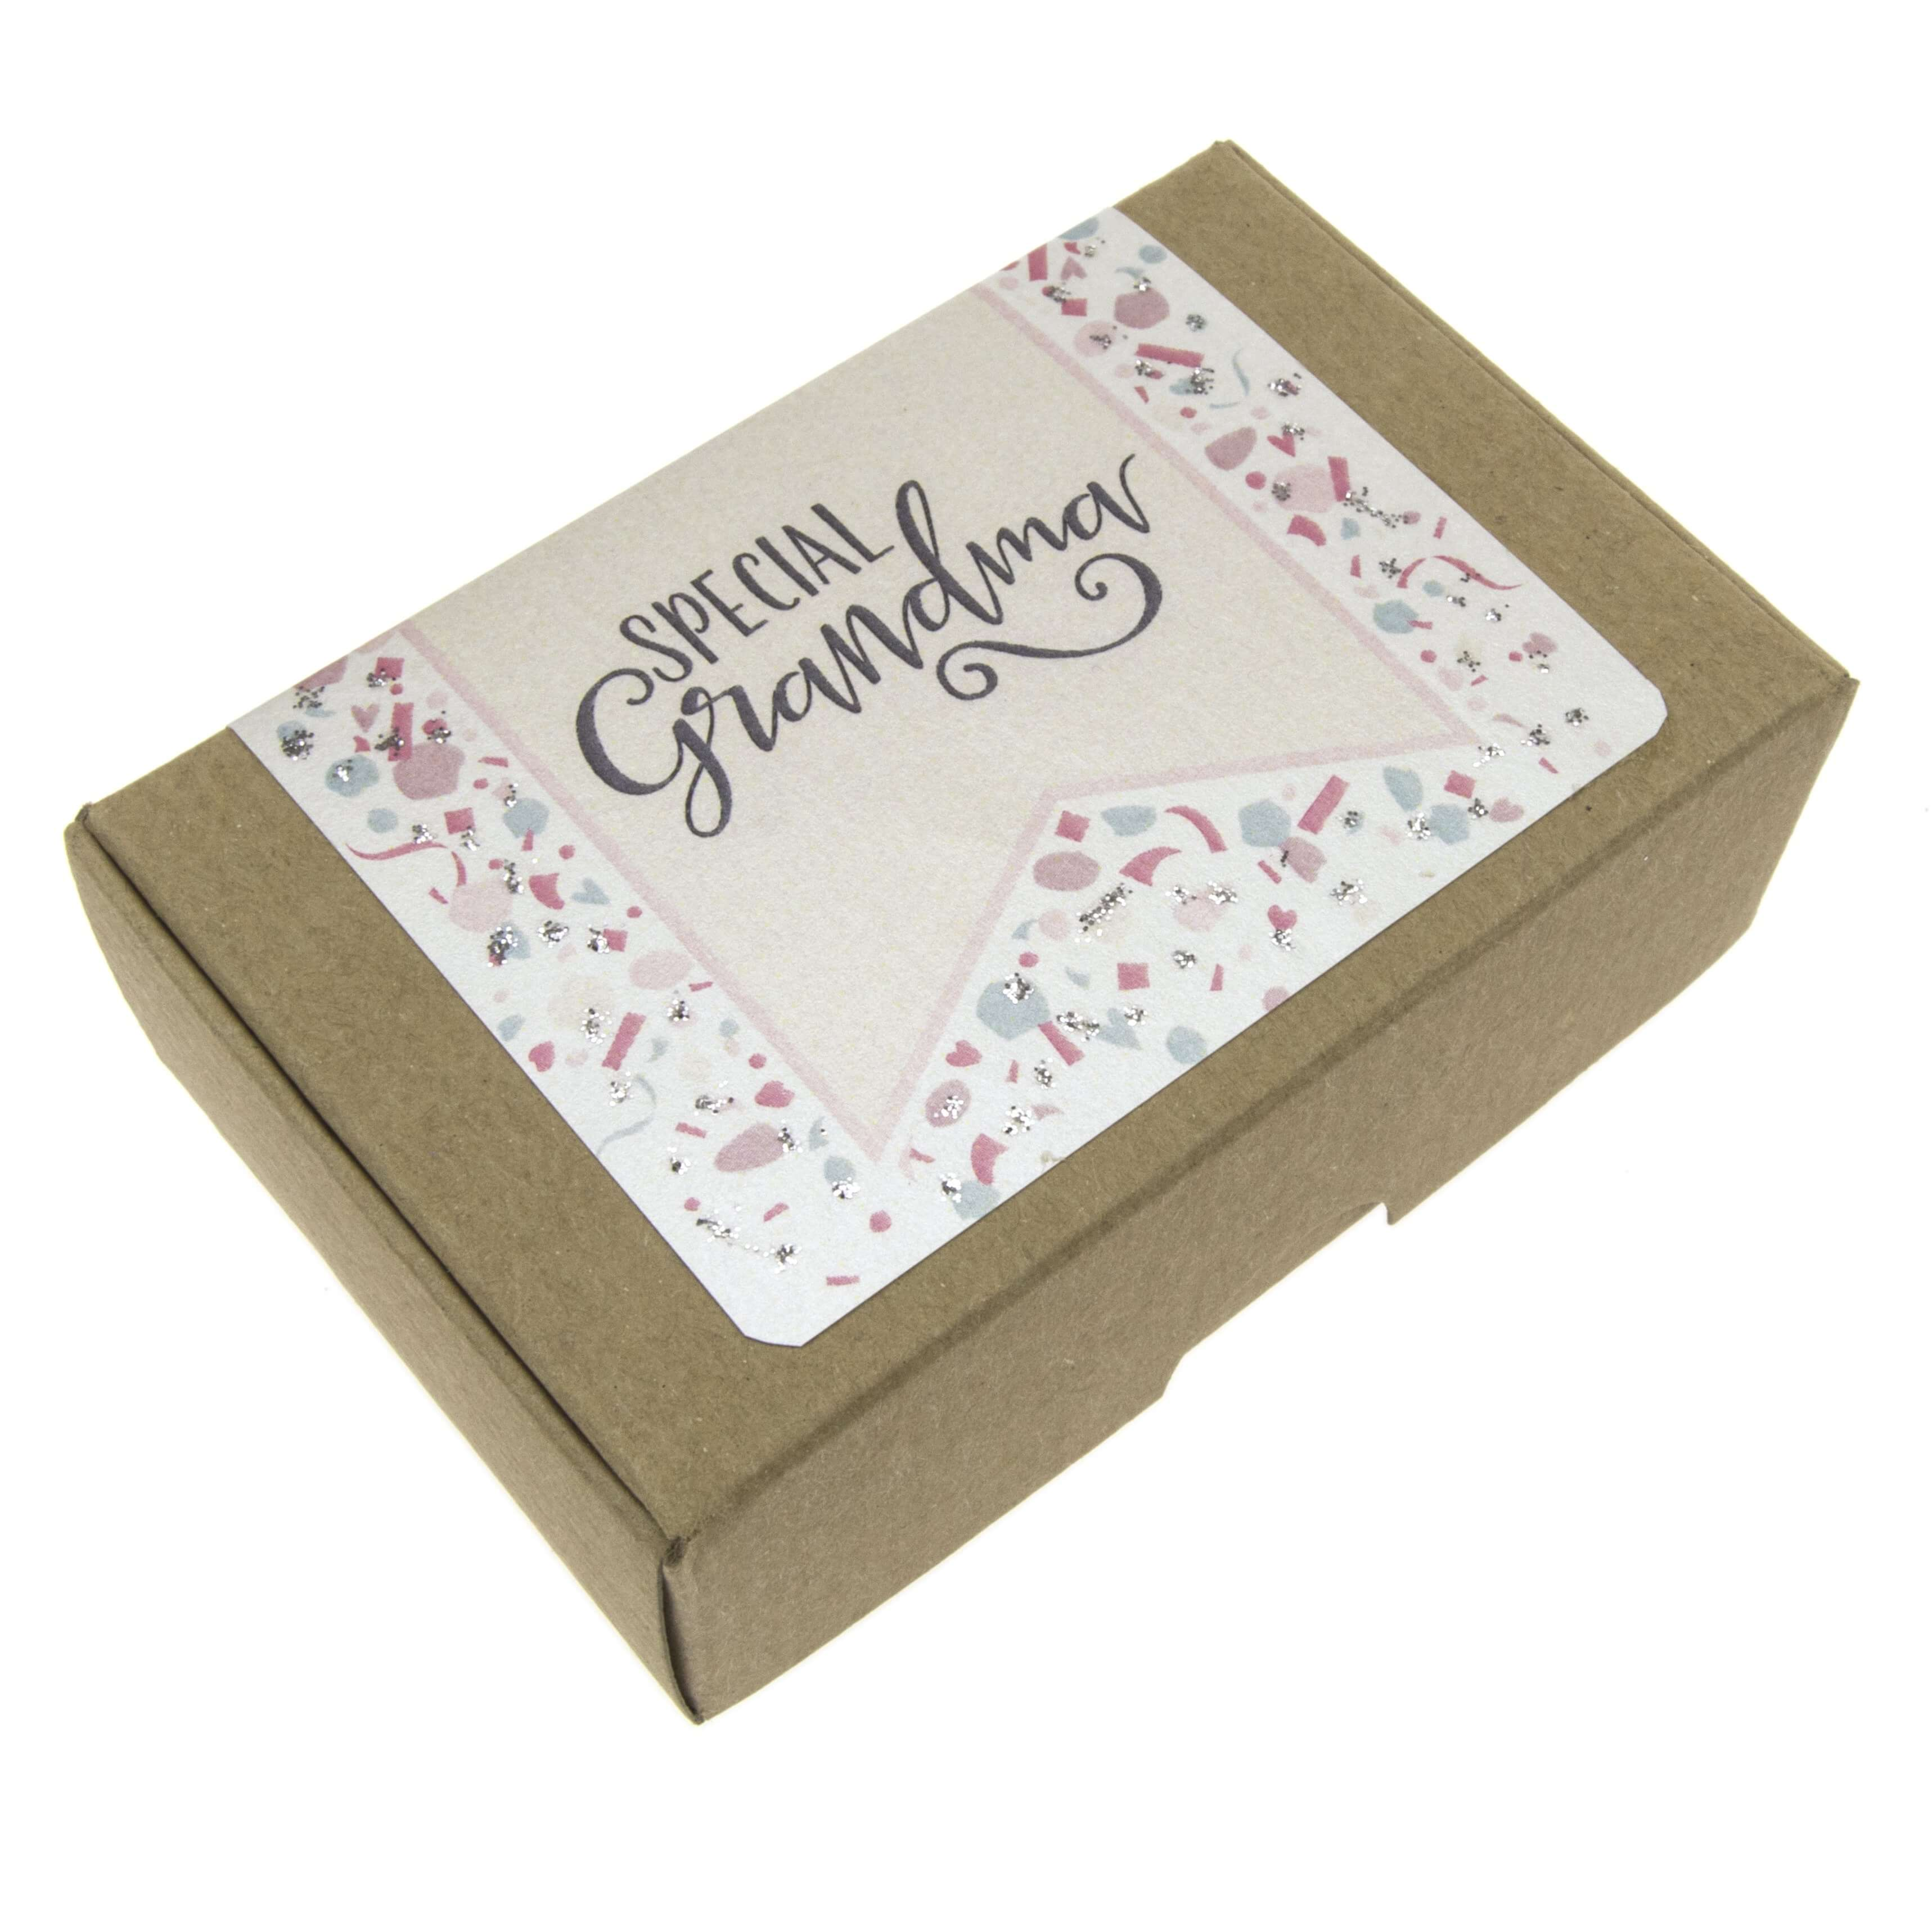 Special Grandma Gift Soap